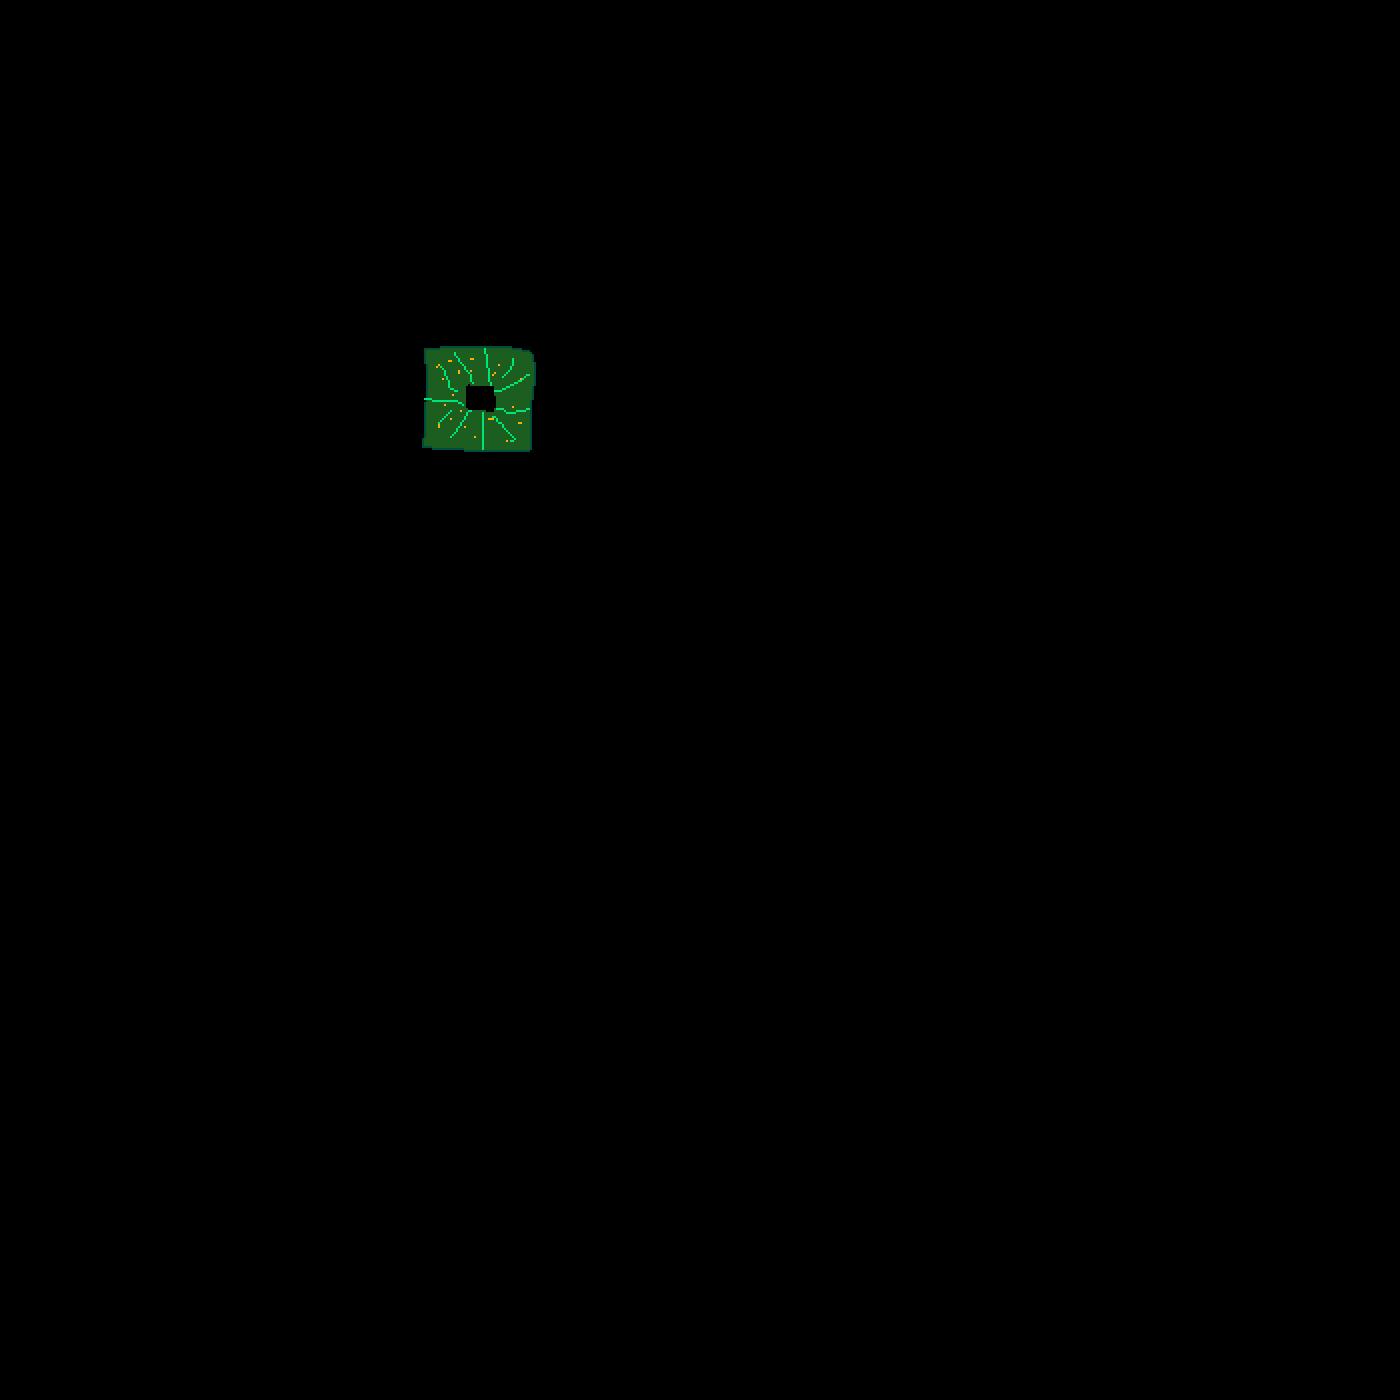 micro chip by deadinside1